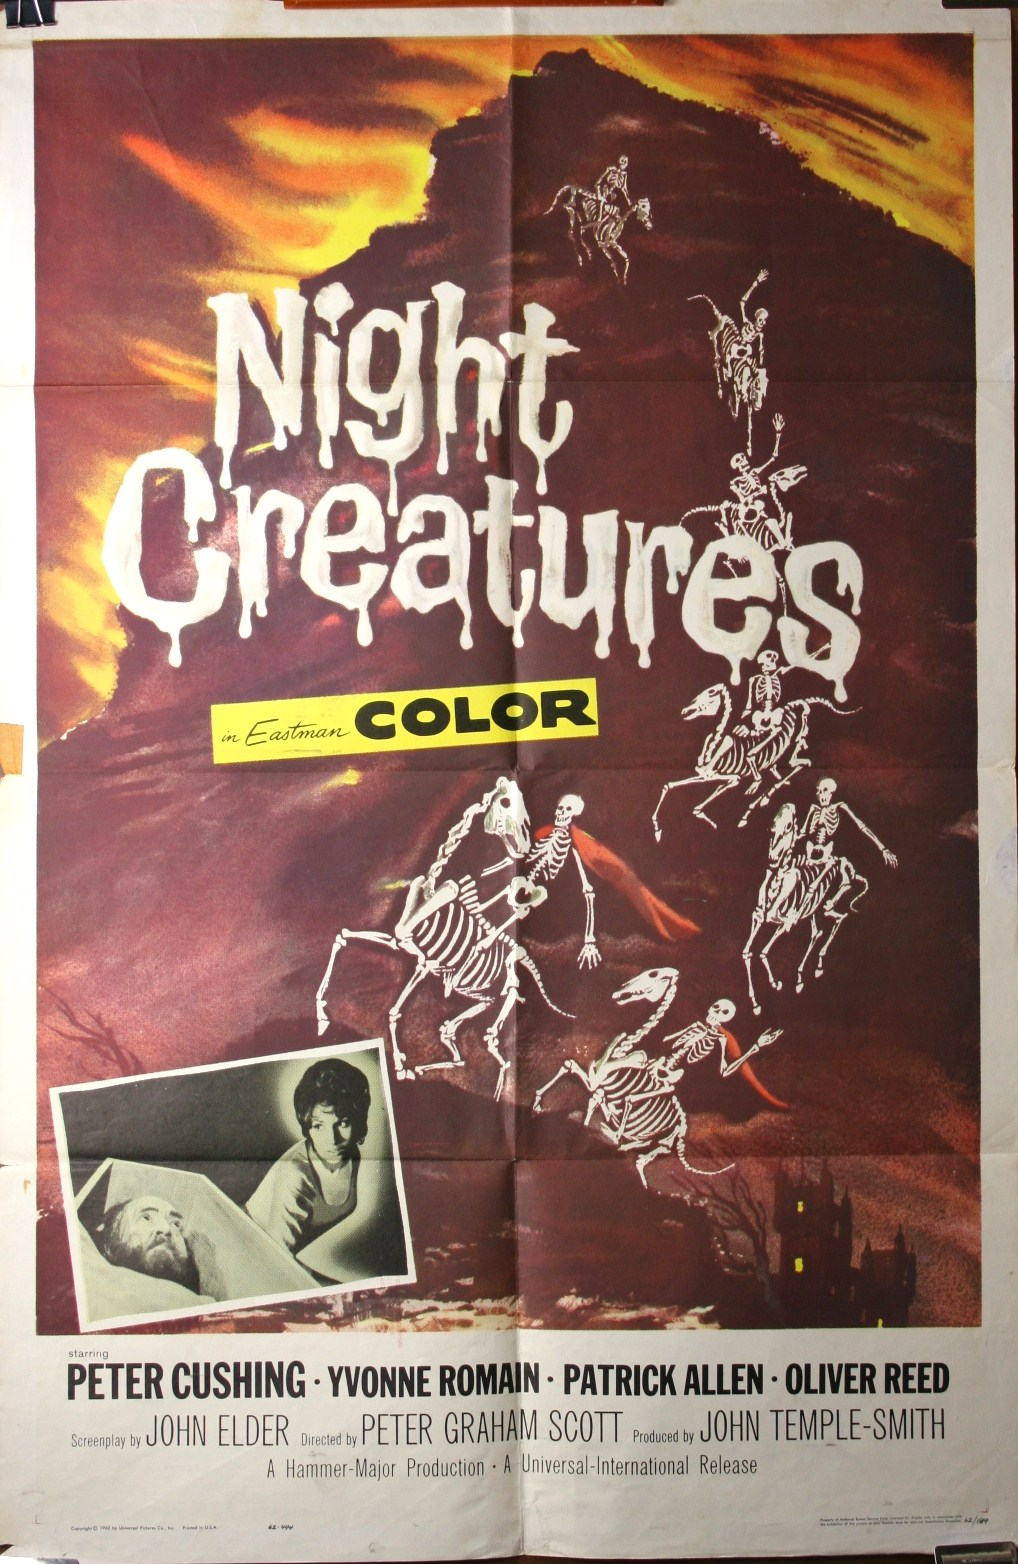 NIGHT CREATURES Peter Cushing Original Hammer Horror Movie Theater